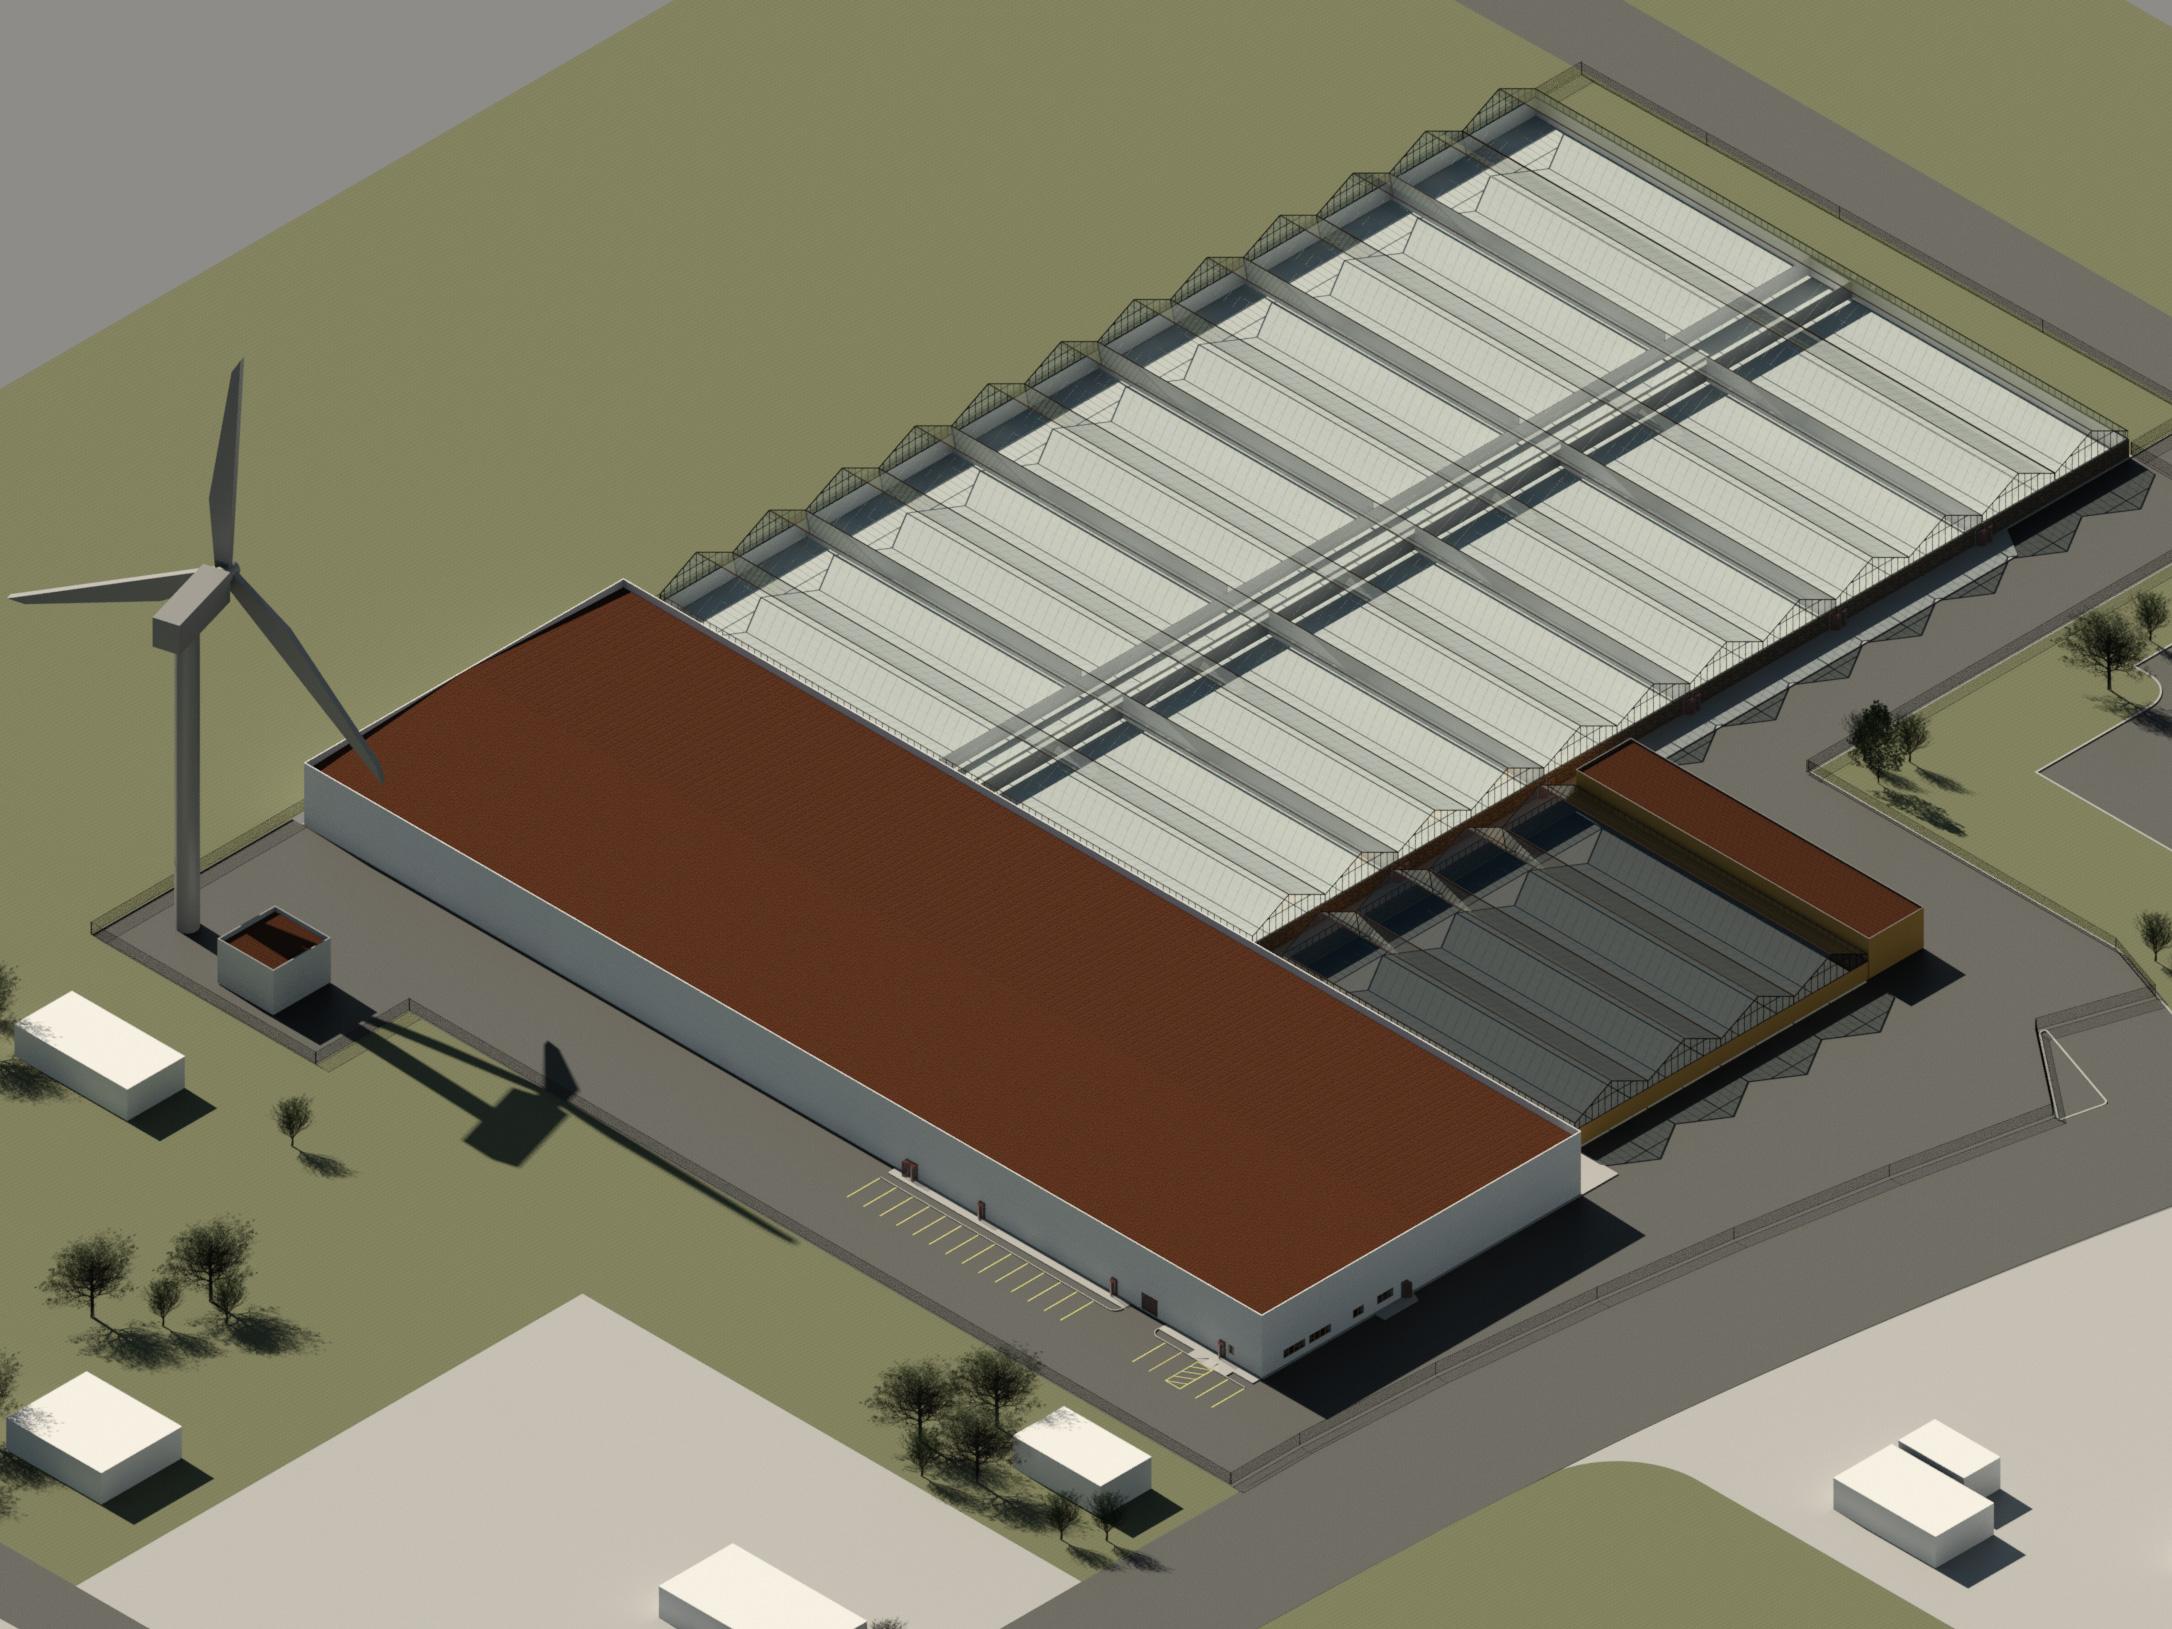 Cultivation Facilities Build | Cannabis Cultivation Facility Design